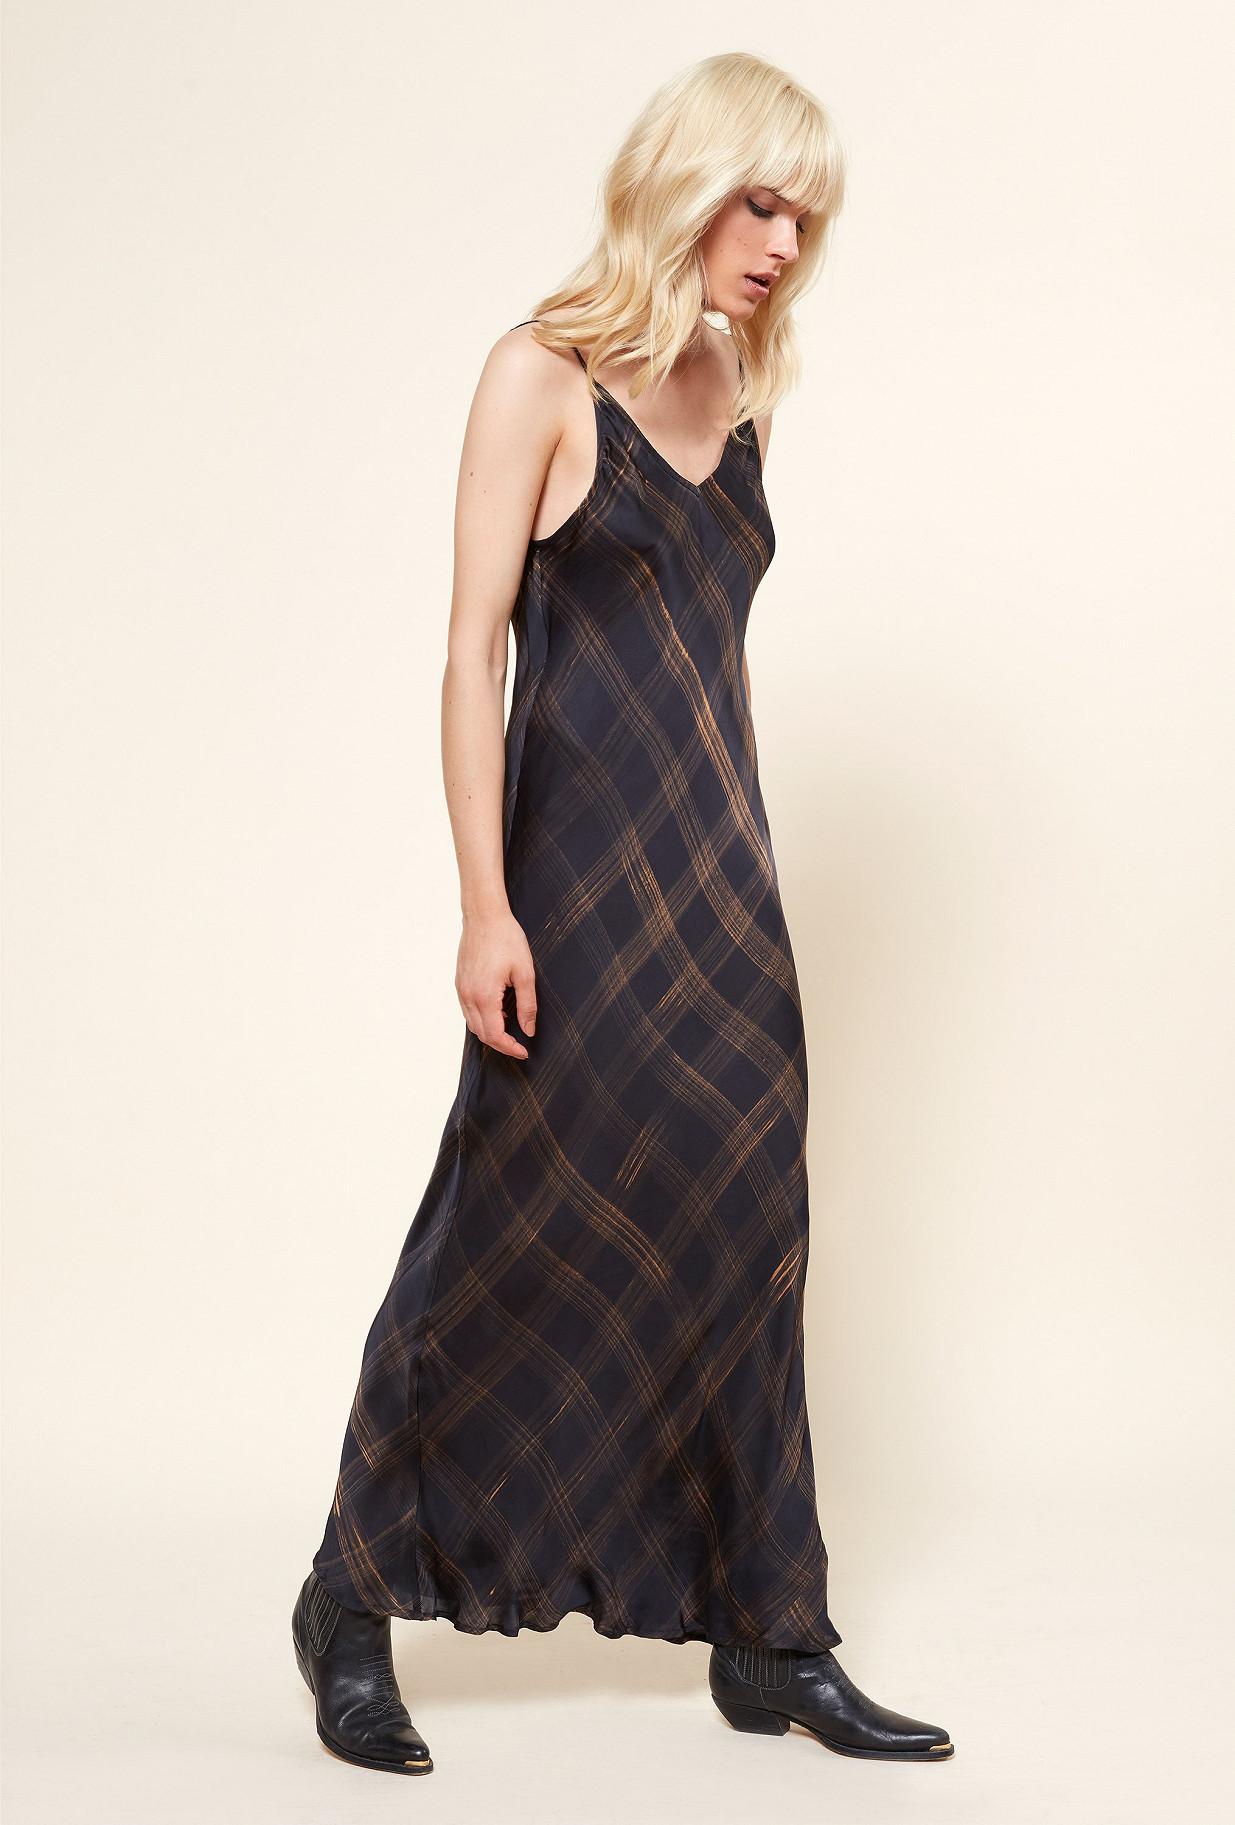 clothes store Dress  Grenelle french designer fashion Paris